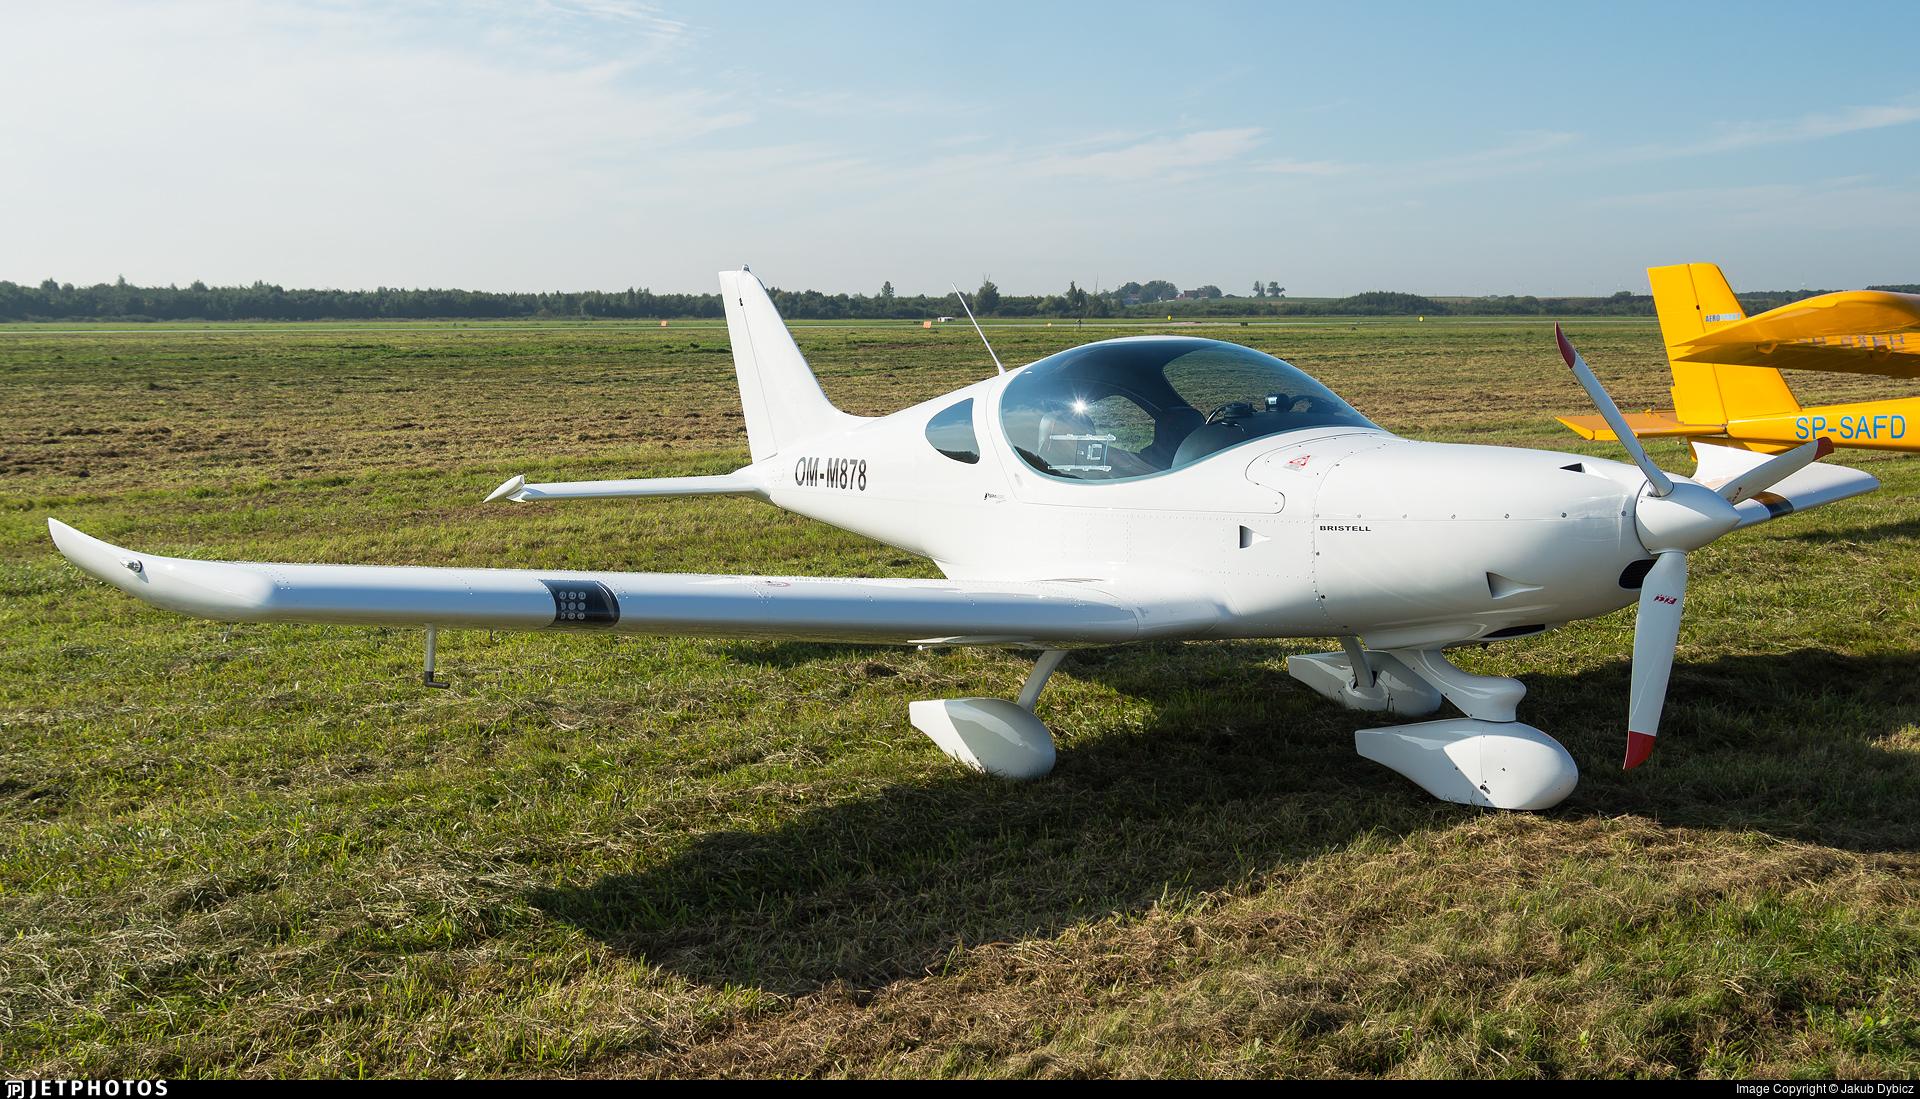 OM-M878 - BRM Aero Bristell - Private